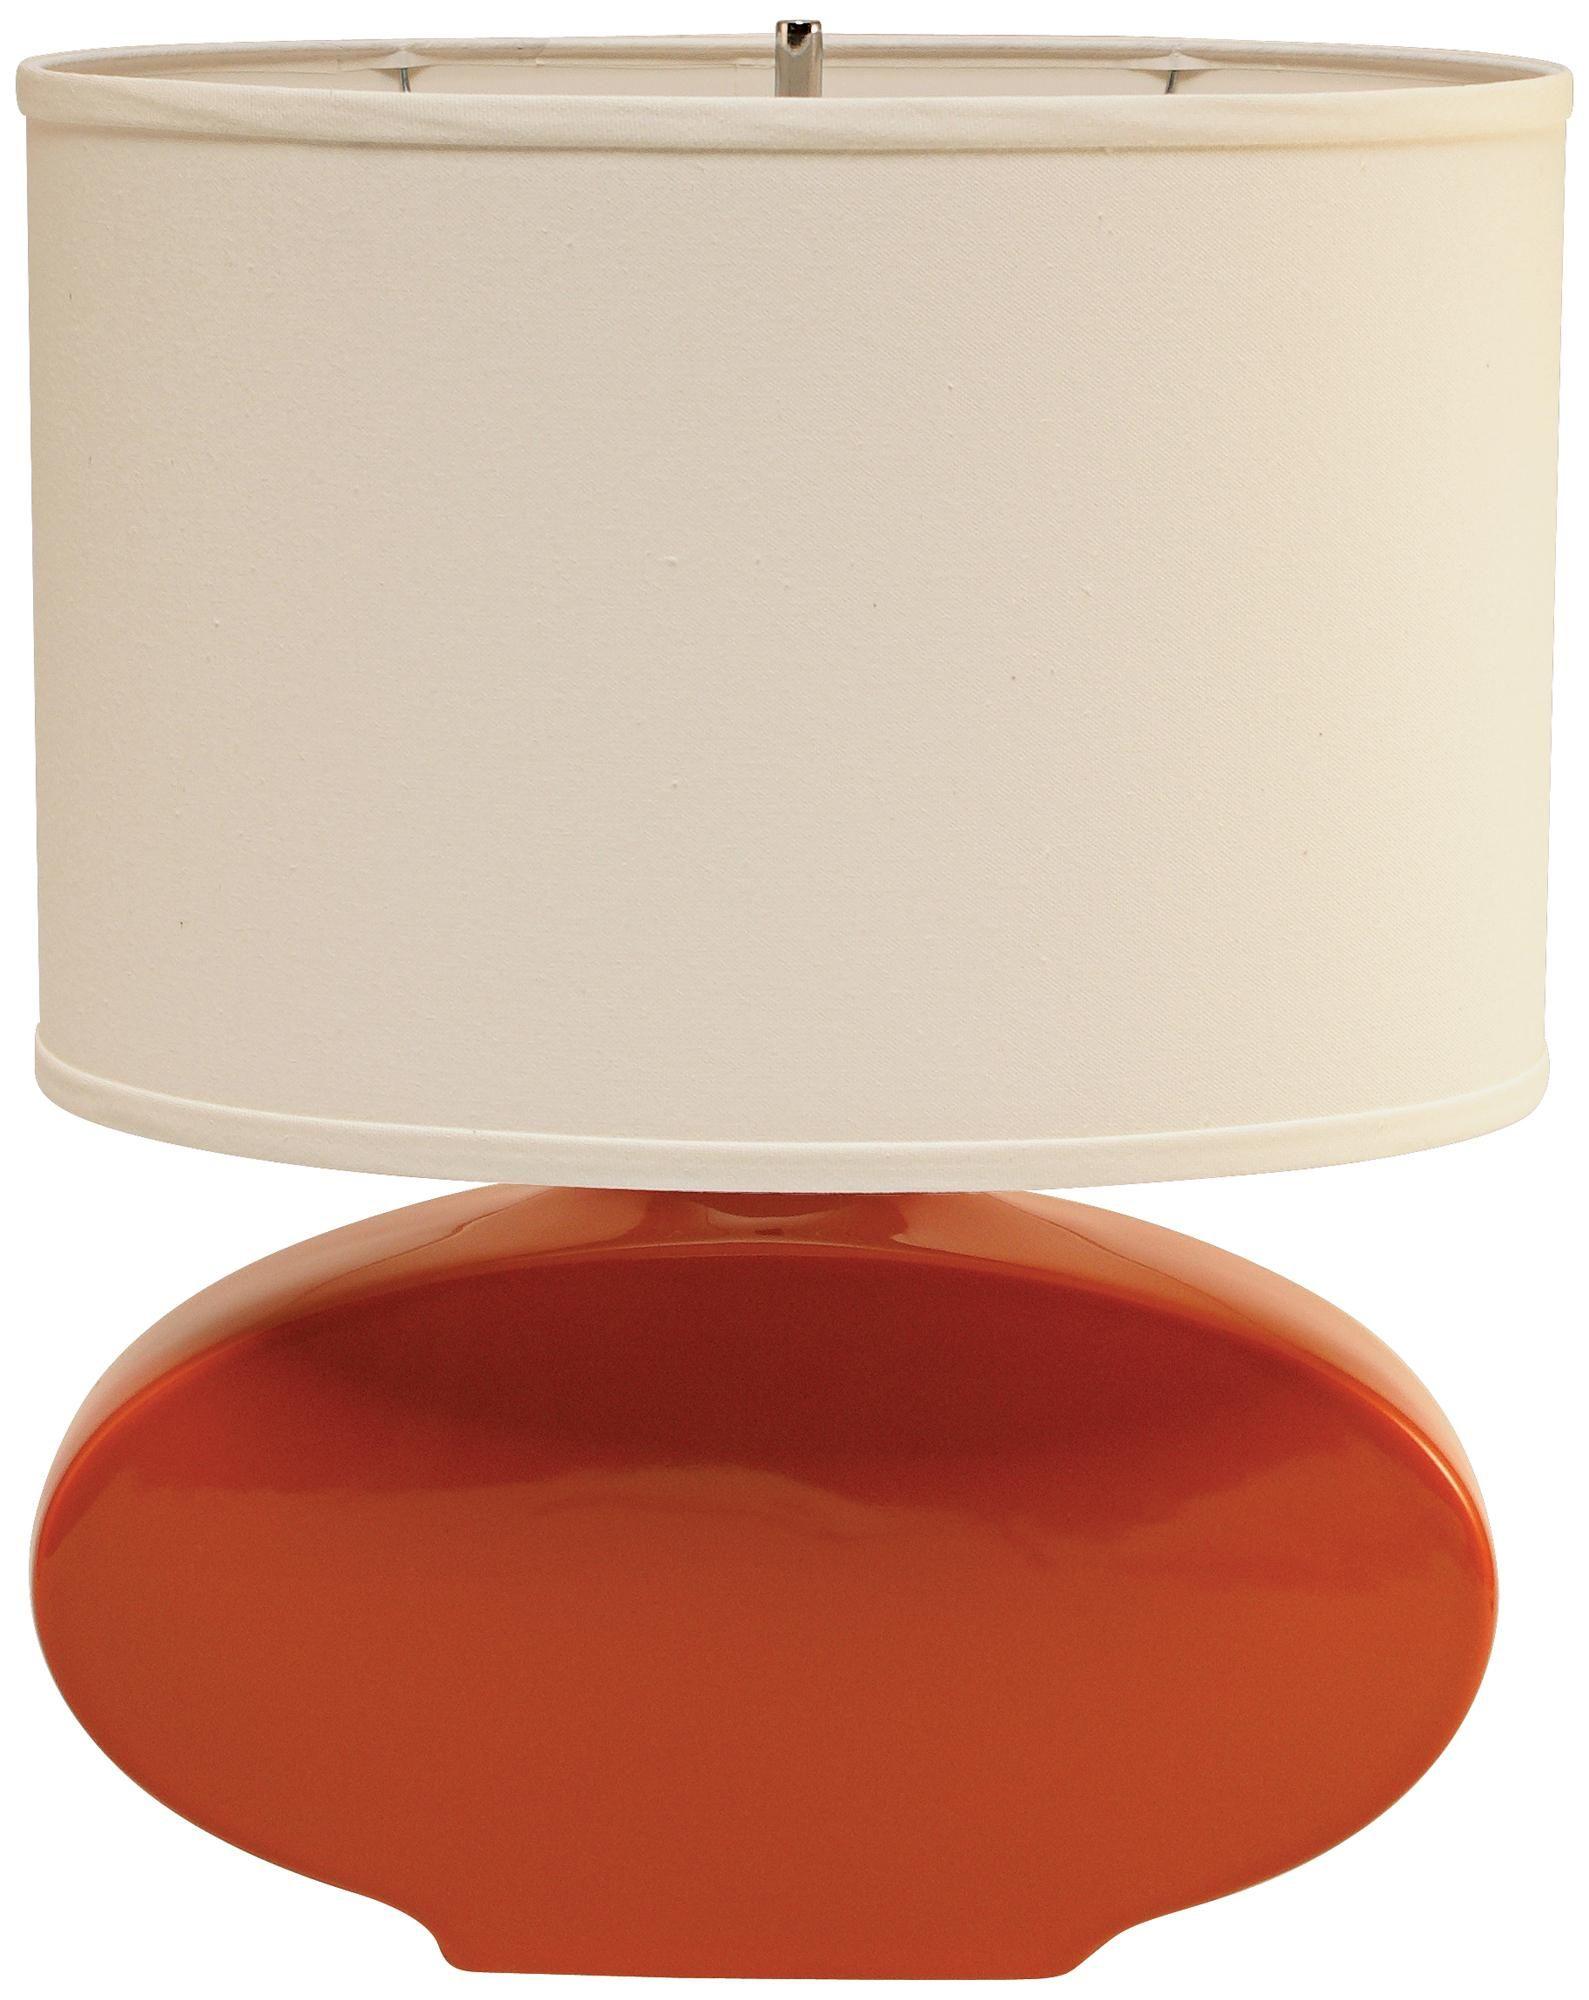 Haeger Potteries Paprika Oval Ceramic Table Lamp P1761 Lamps Plus Lamp Table Lamp Ceramic Table Lamps